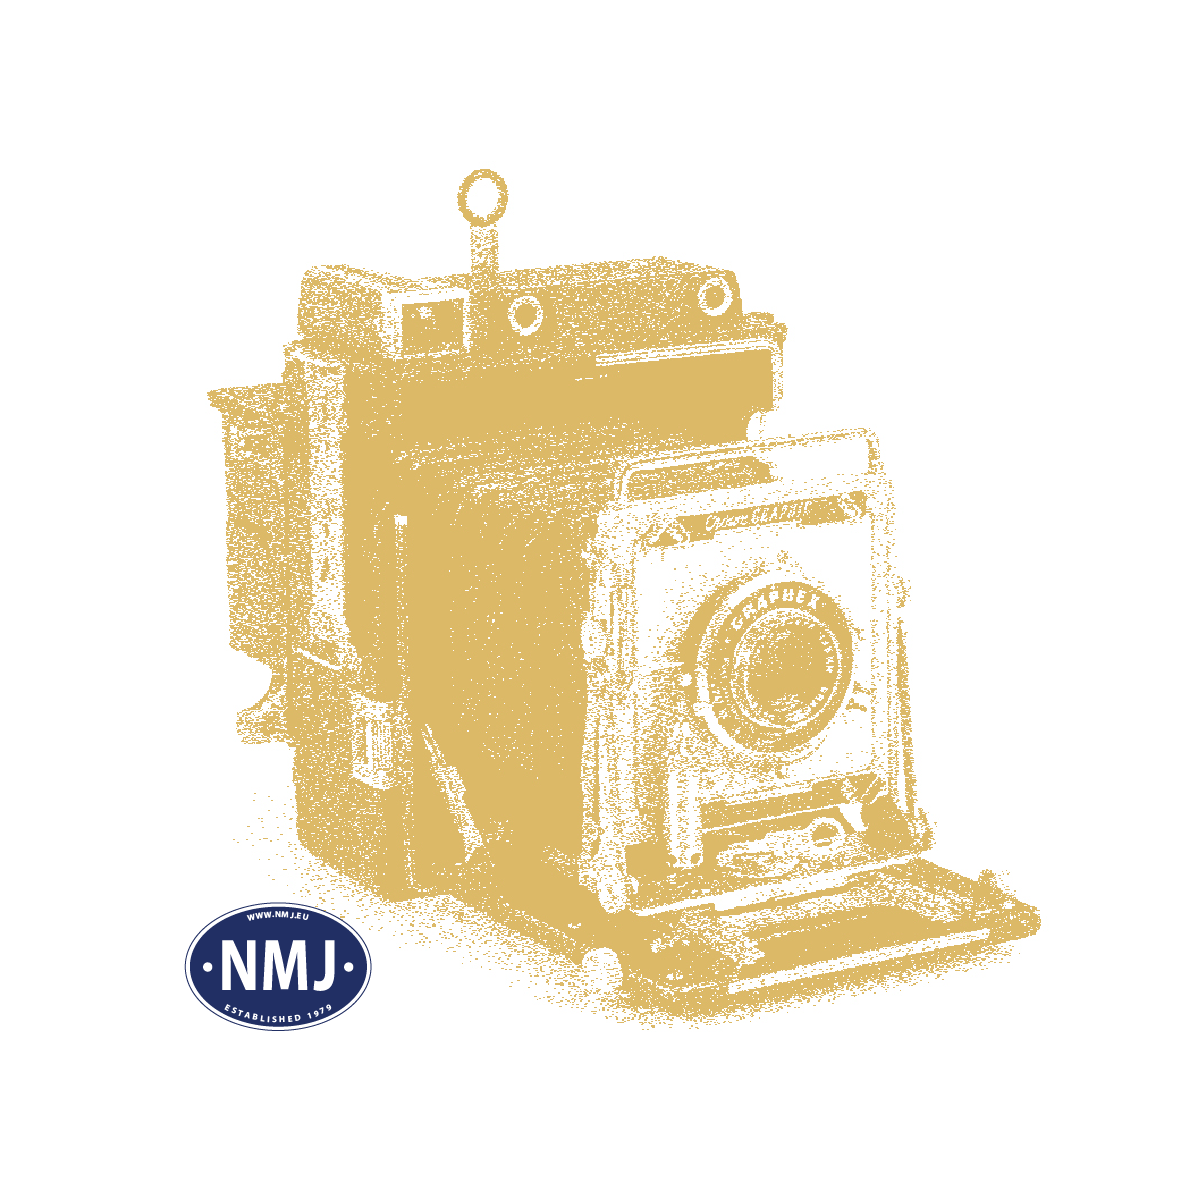 NOC15410 - Gudstjeneste